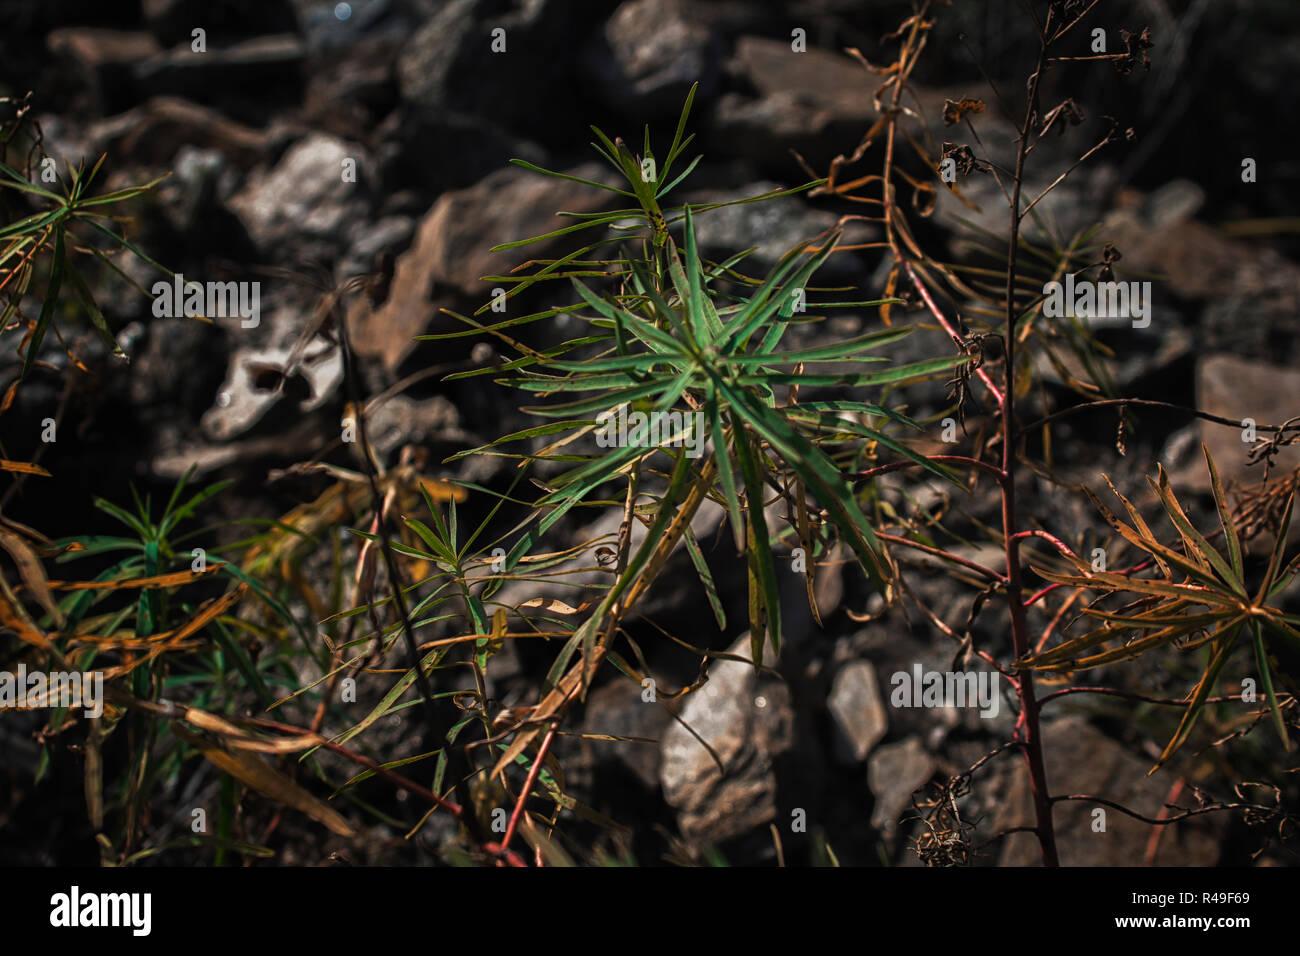 Wild plants. Plants background. Plants and stones. - Stock Image